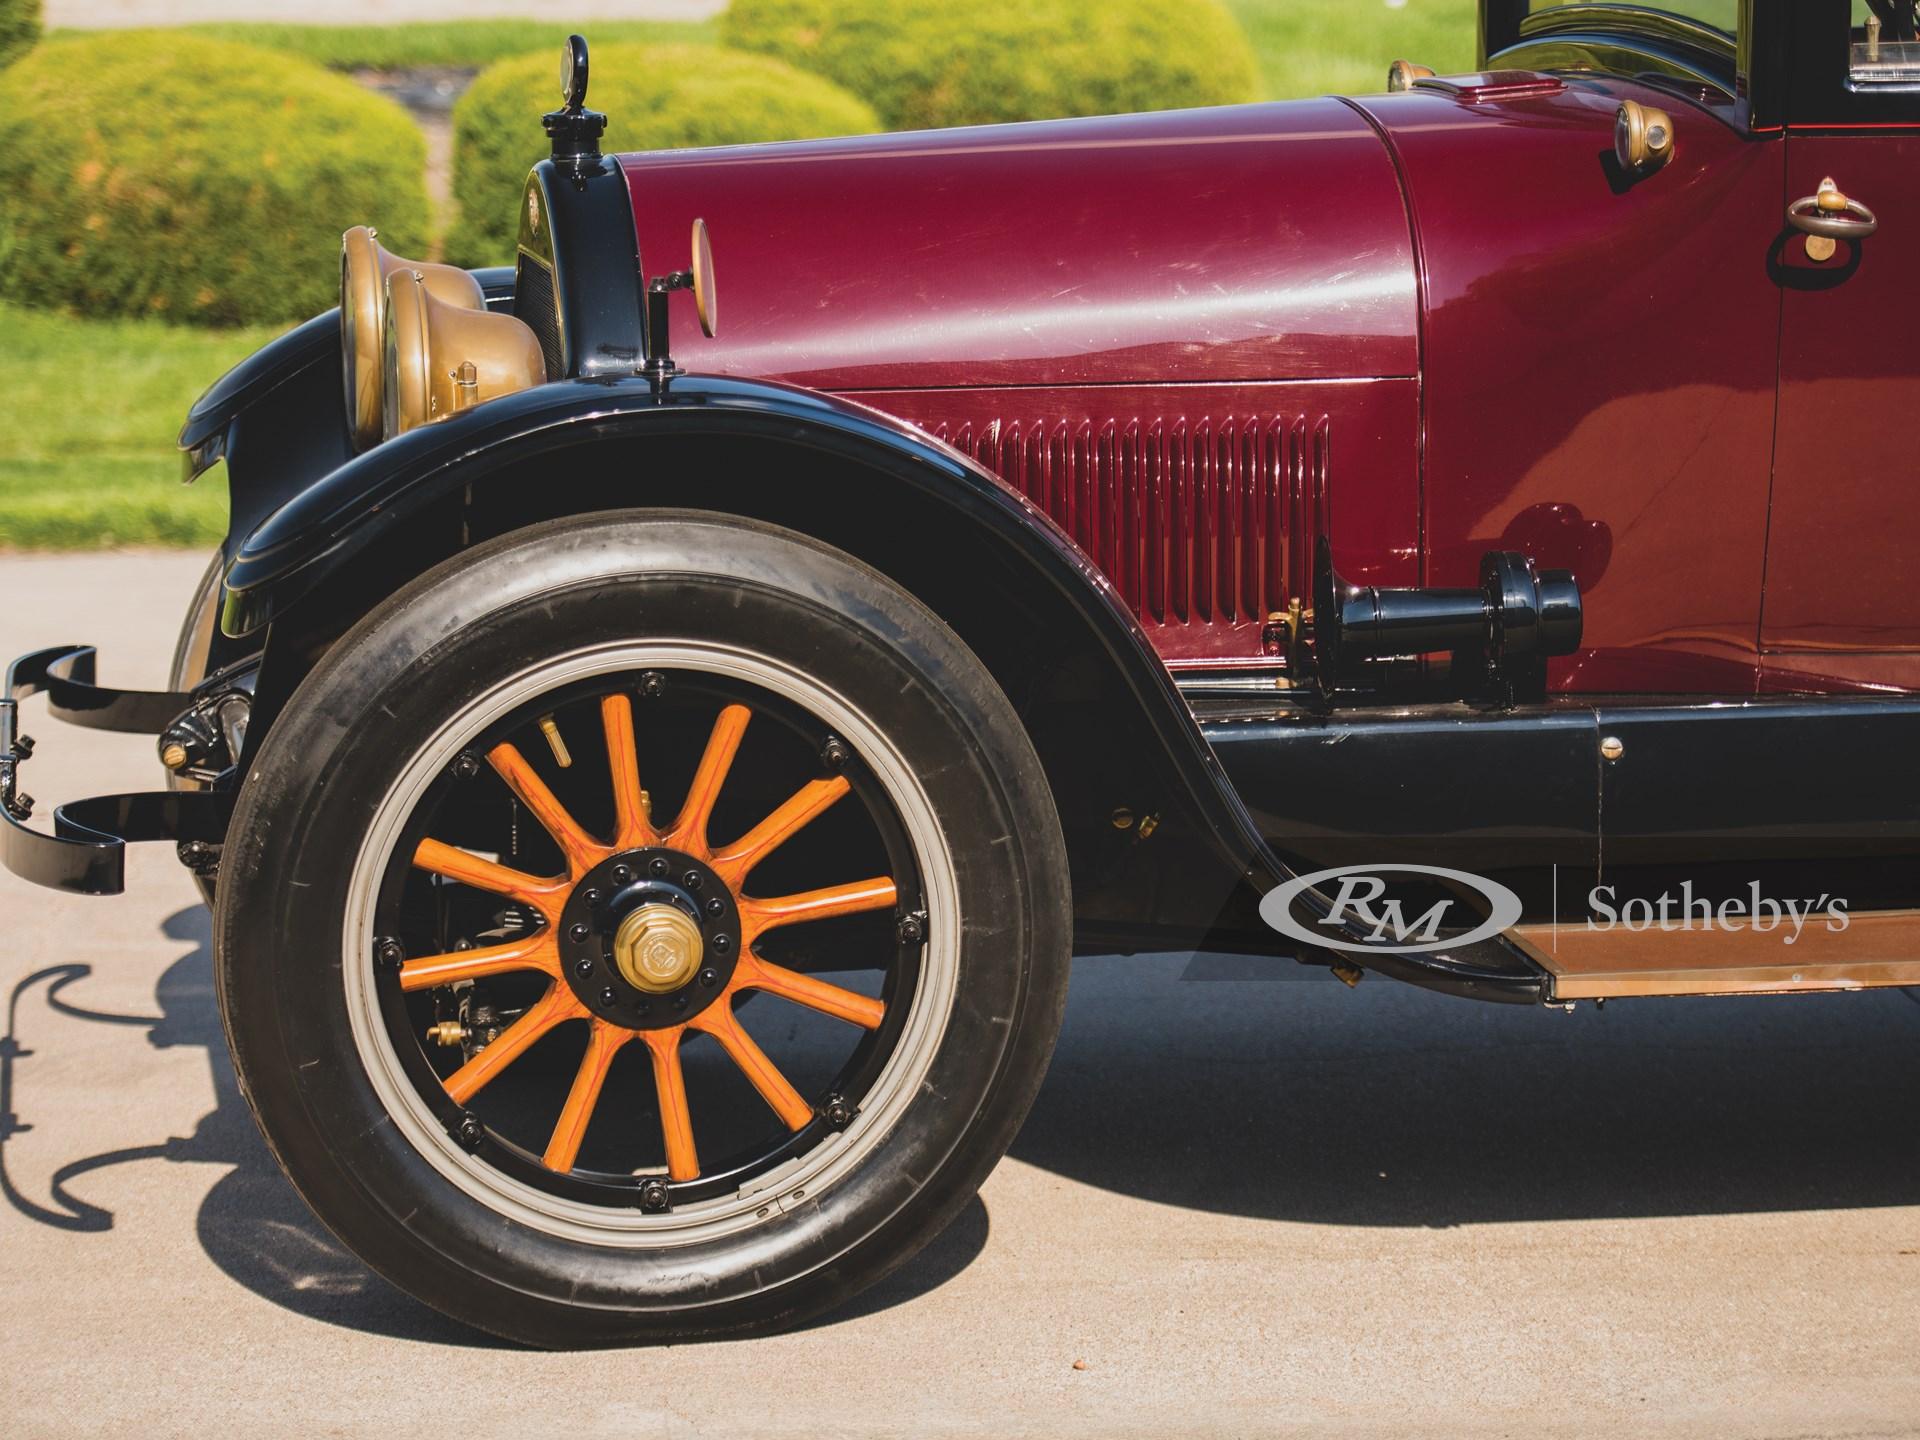 1921 Cadillac Type 59 Four-Passenger Victoria  -